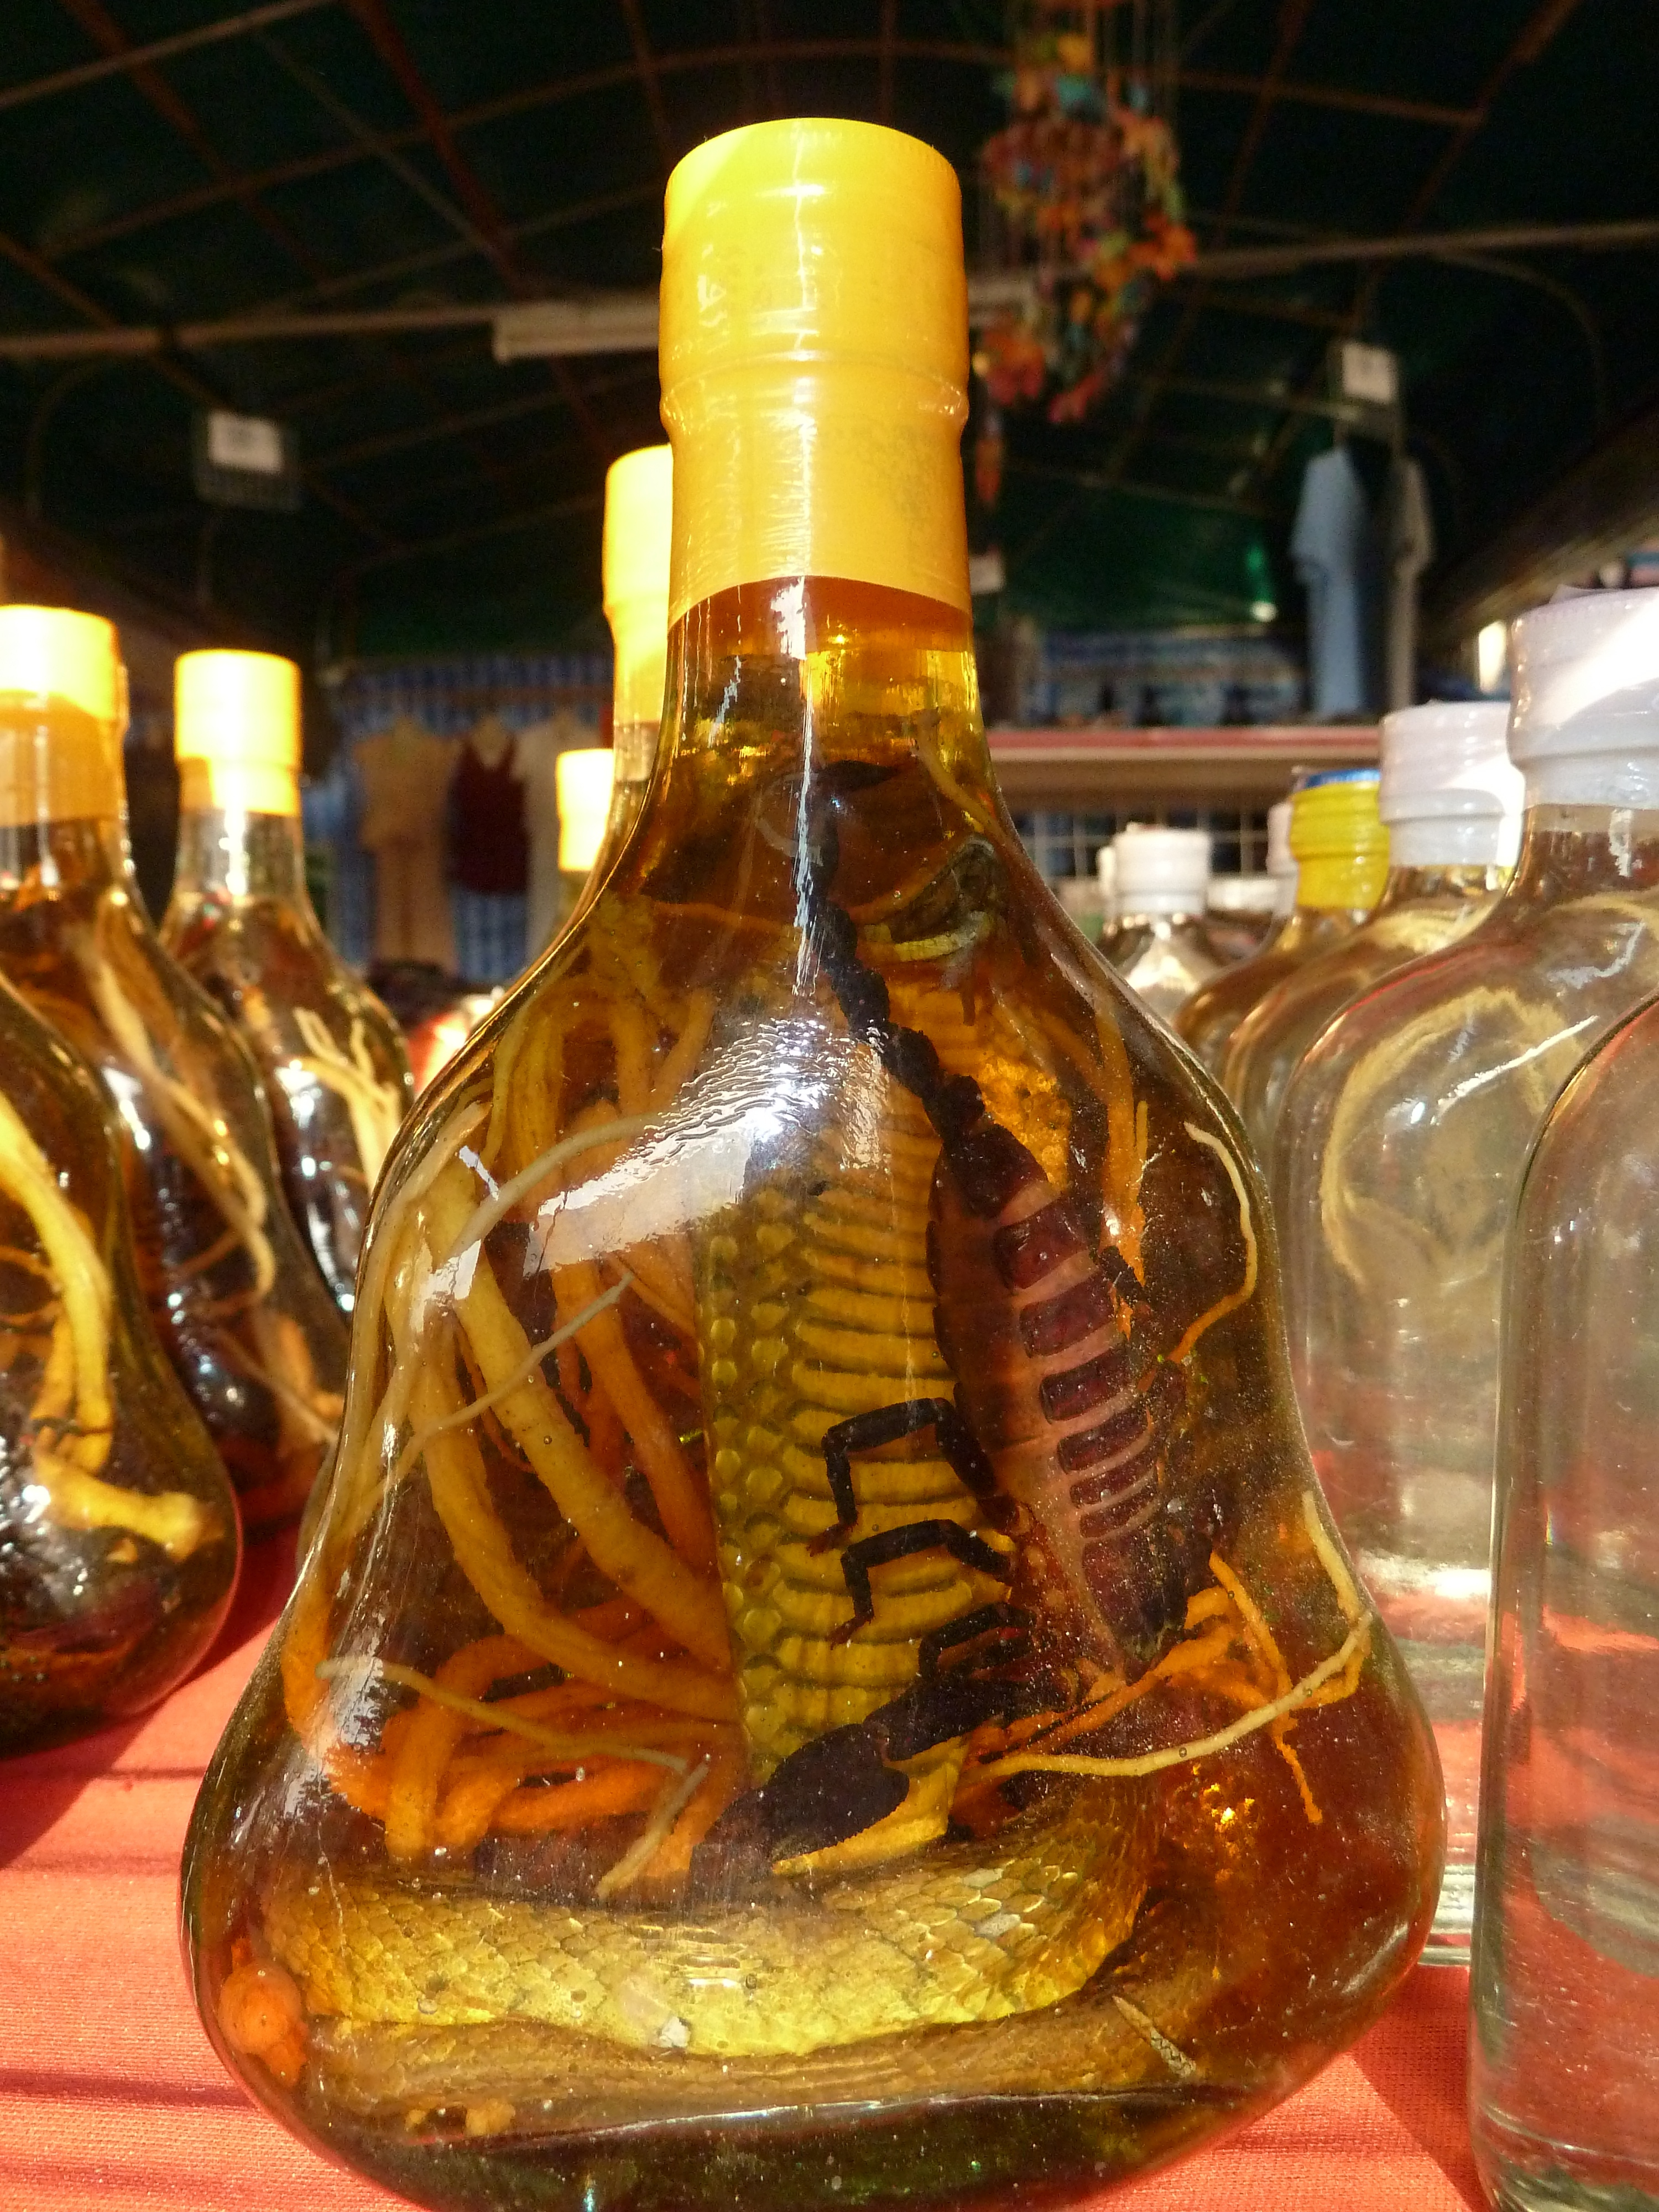 File:Snake wine P1110606.JPG - Wikimedia Commons